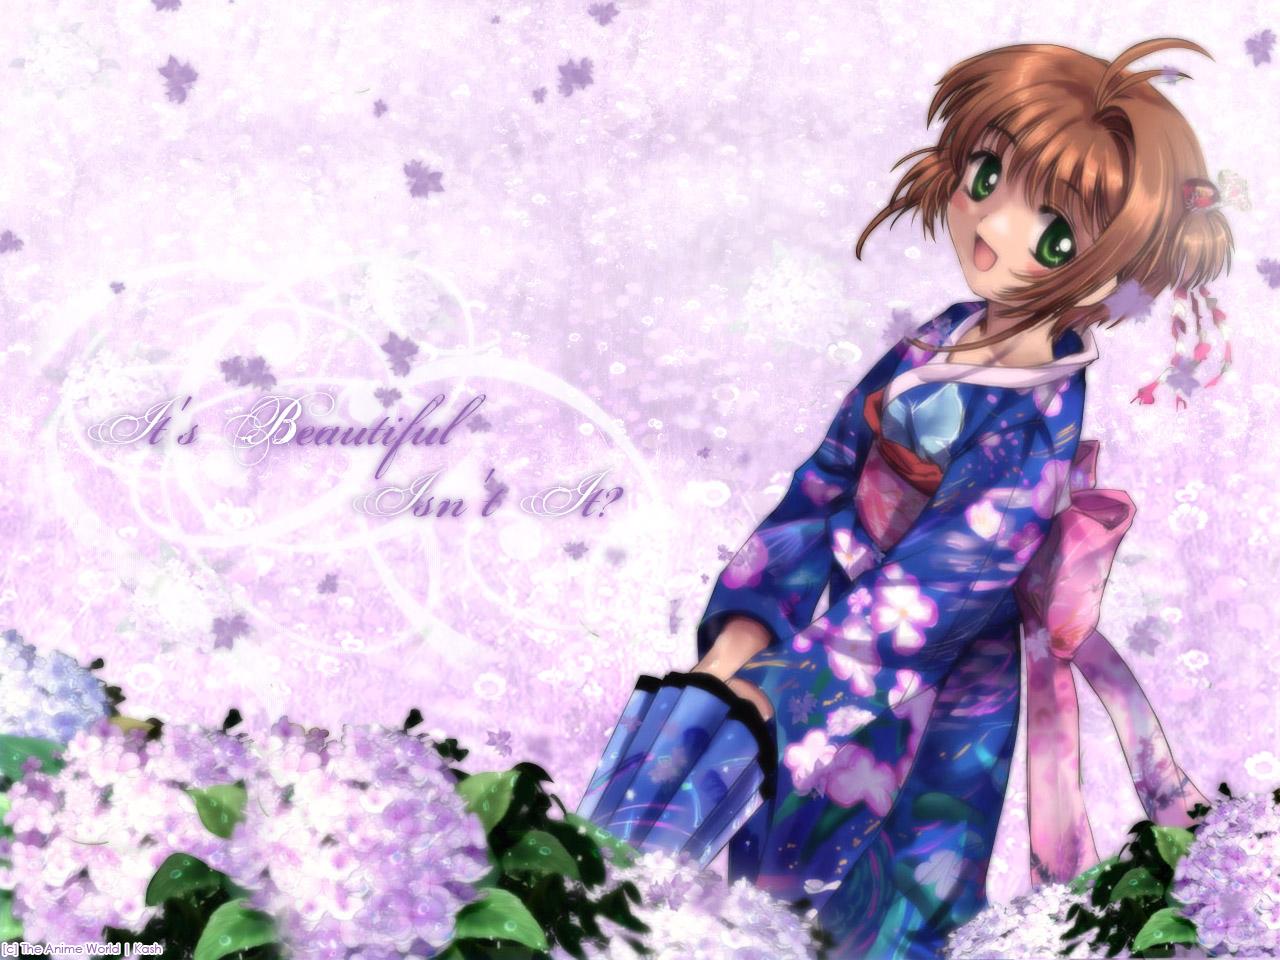 http://4.bp.blogspot.com/-PX_SFgnT1Zs/TaZOFKJvGGI/AAAAAAAABDg/f0s9NHyRECg/s1600/Card_Captor_Sakura_04.jpg